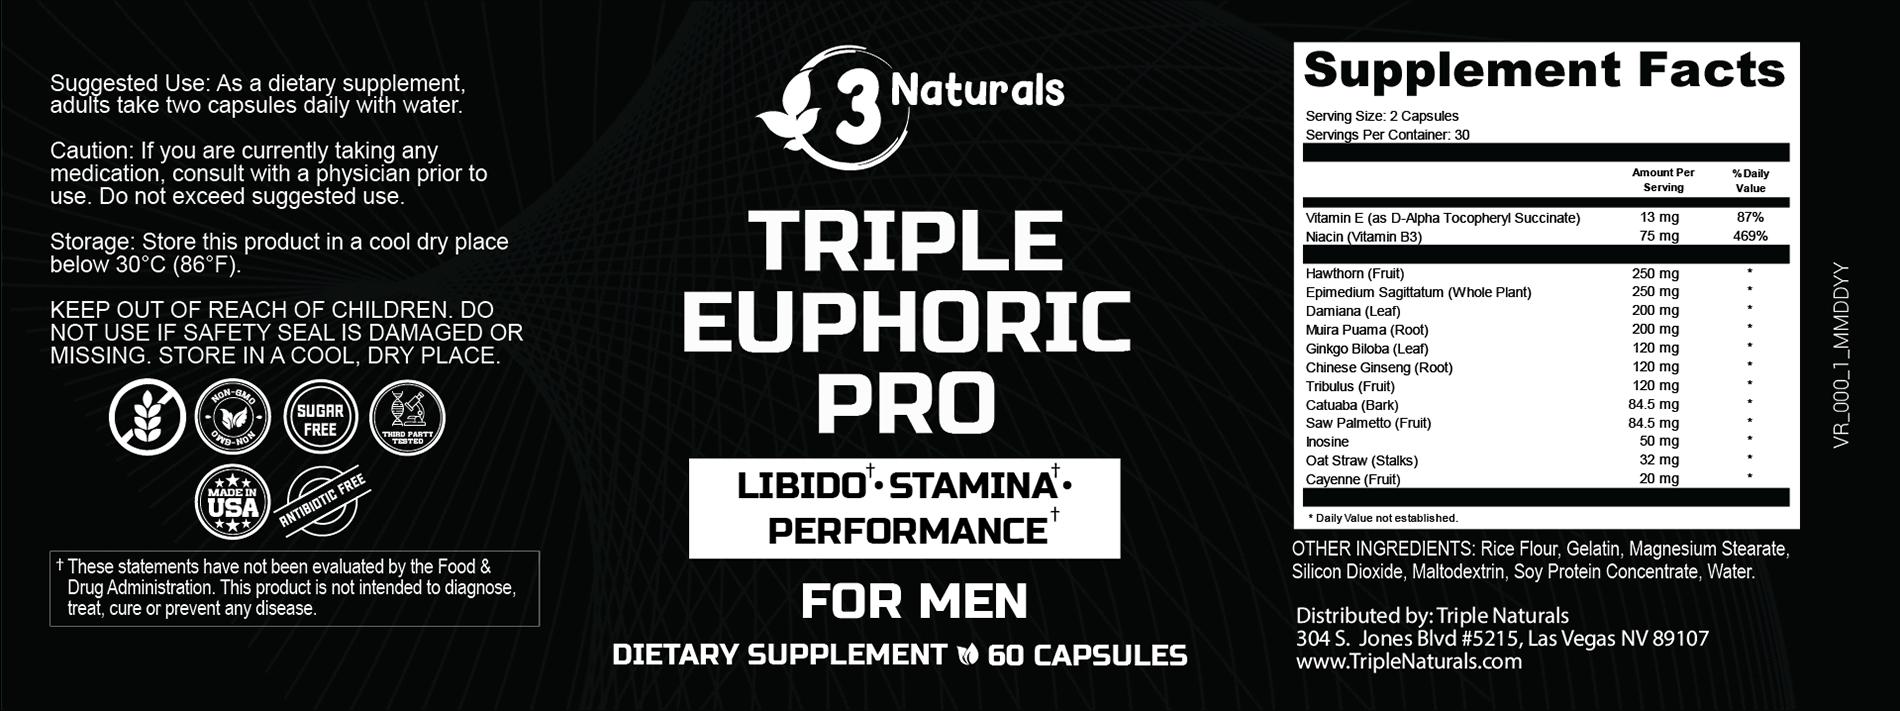 Triple Euphoric Pro Ingredients Label